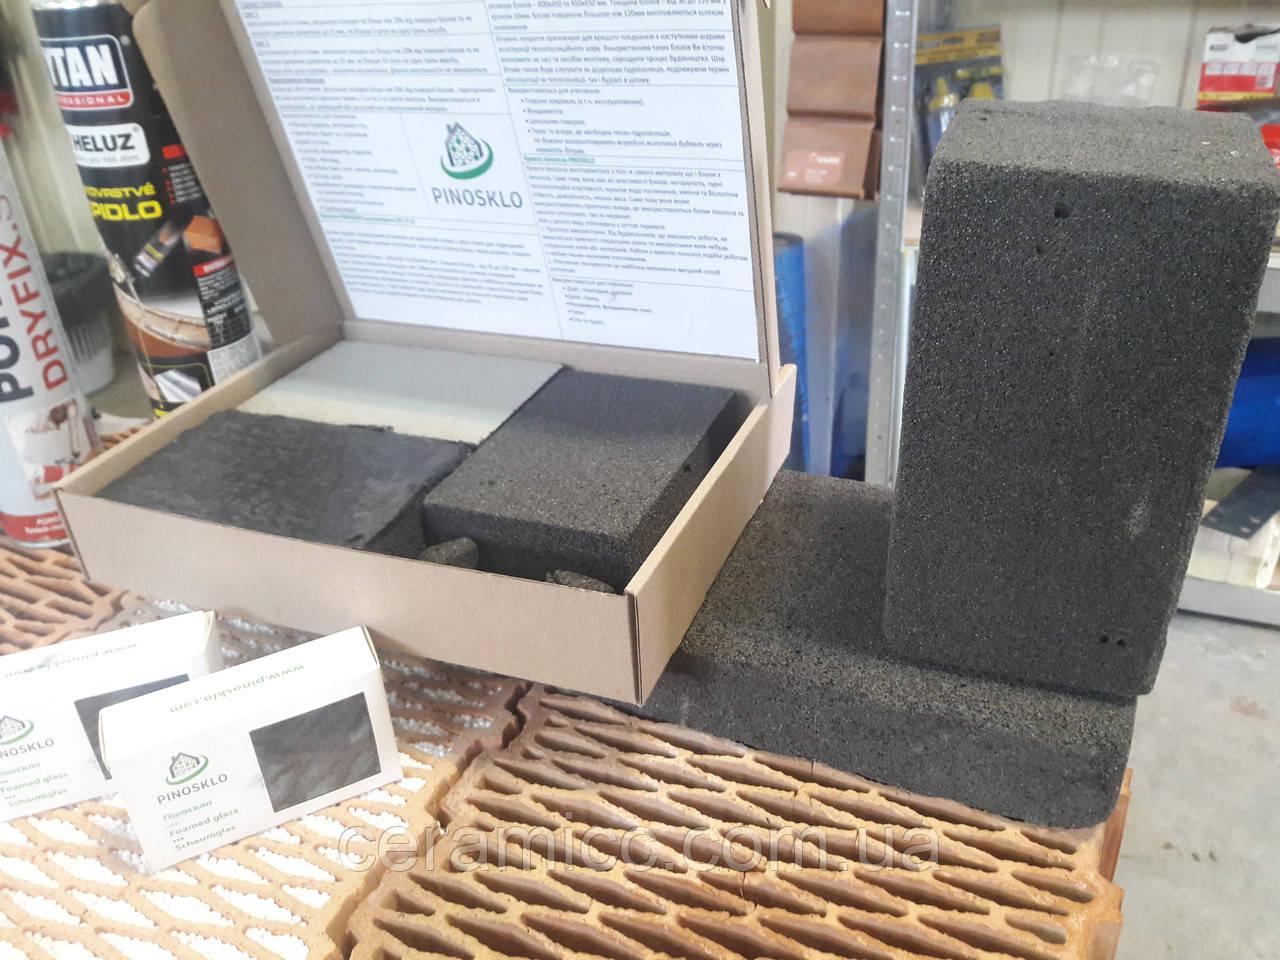 Піноскло у блоках 2 сорт 600*450*30 мм. (450*450*30 мм)